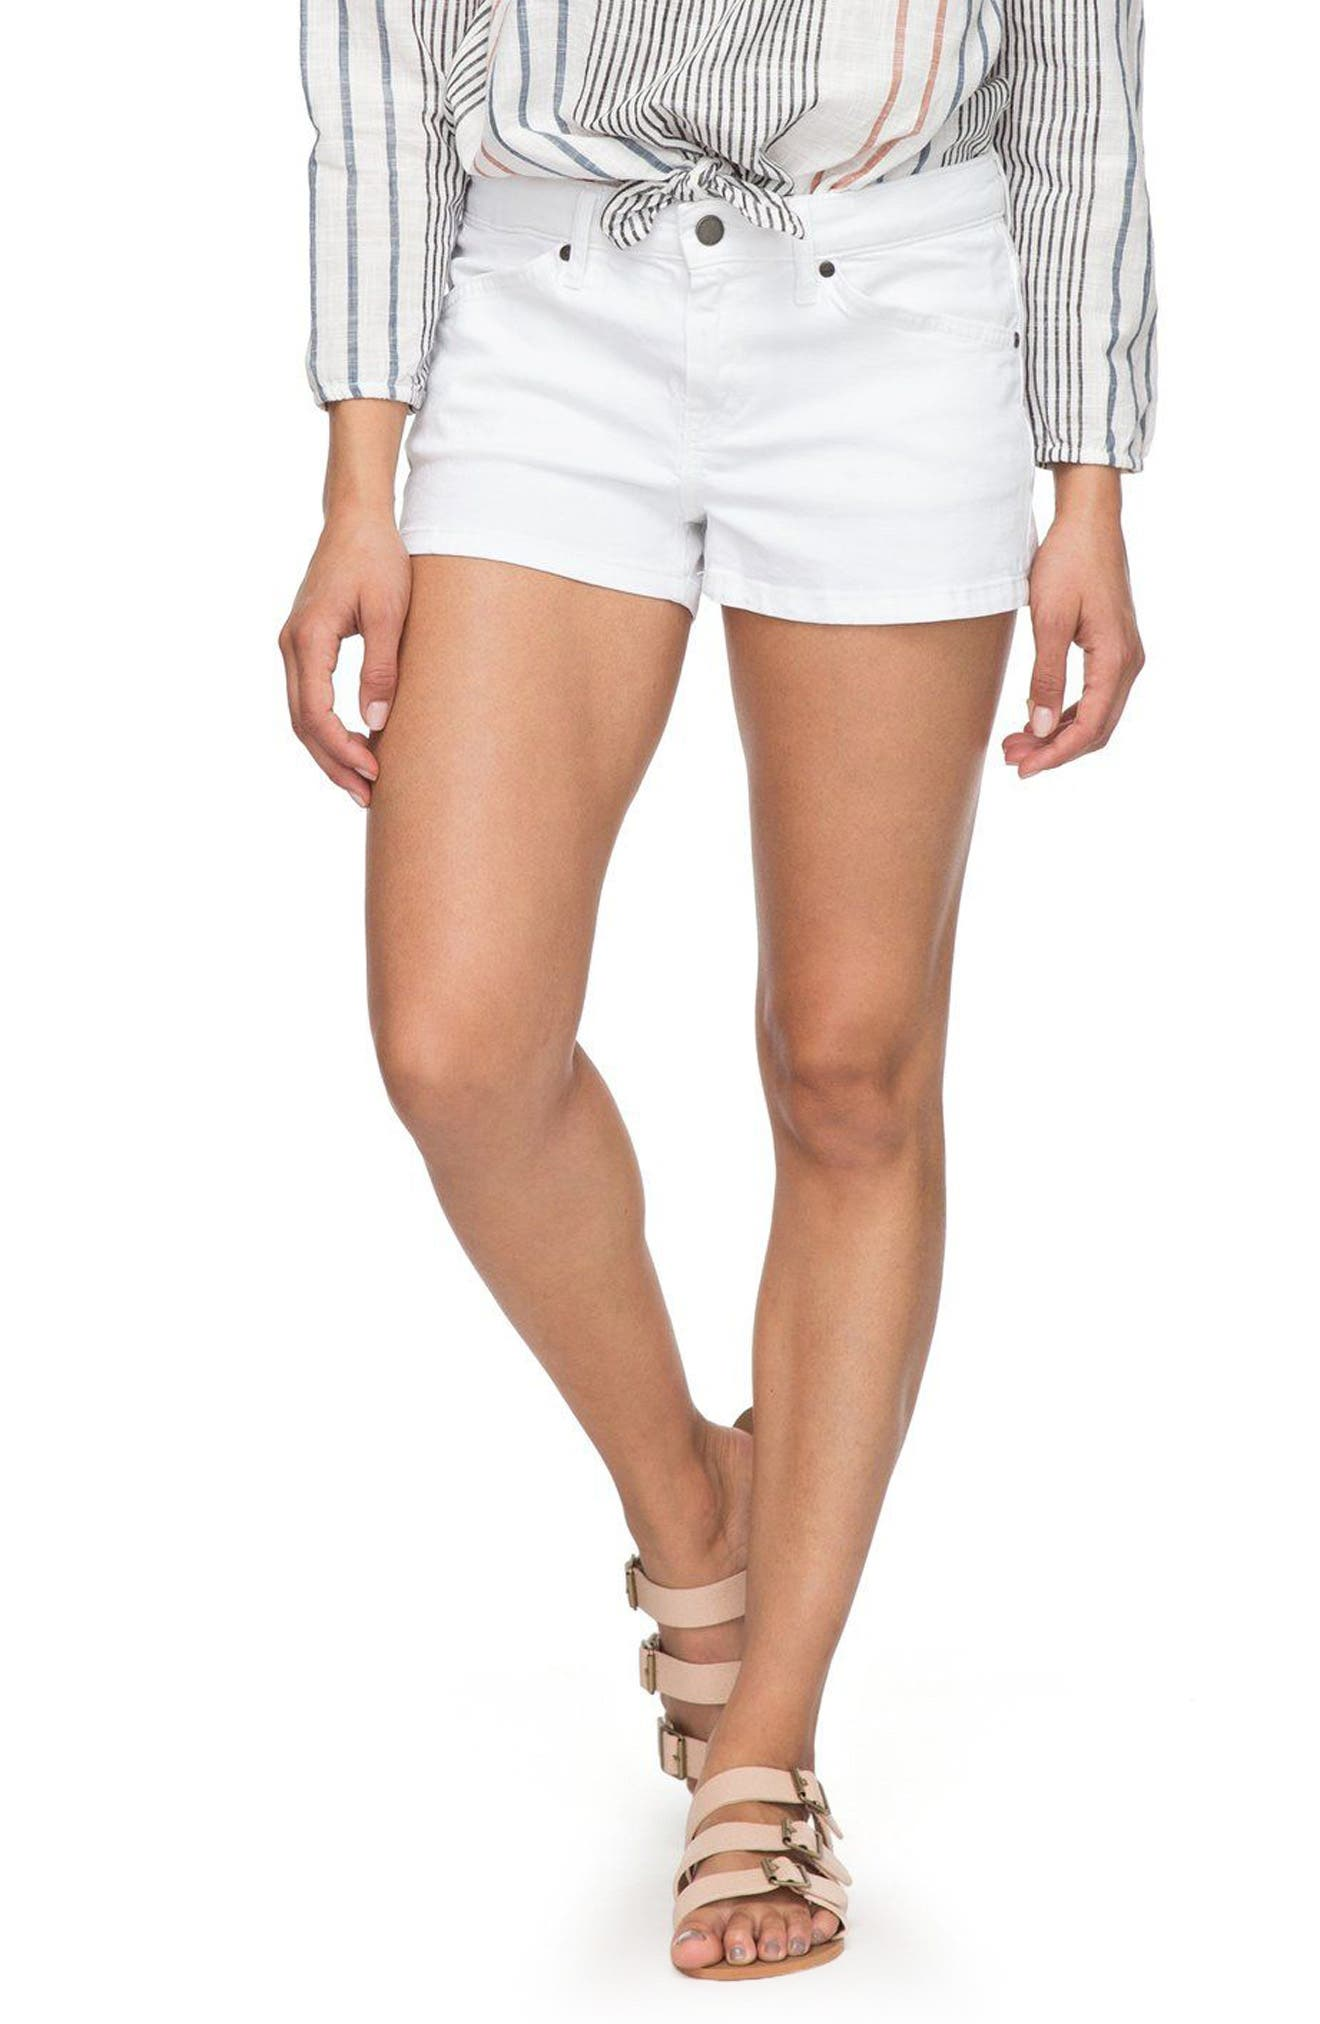 Seatripper Denim Shorts,                             Main thumbnail 1, color,                             White